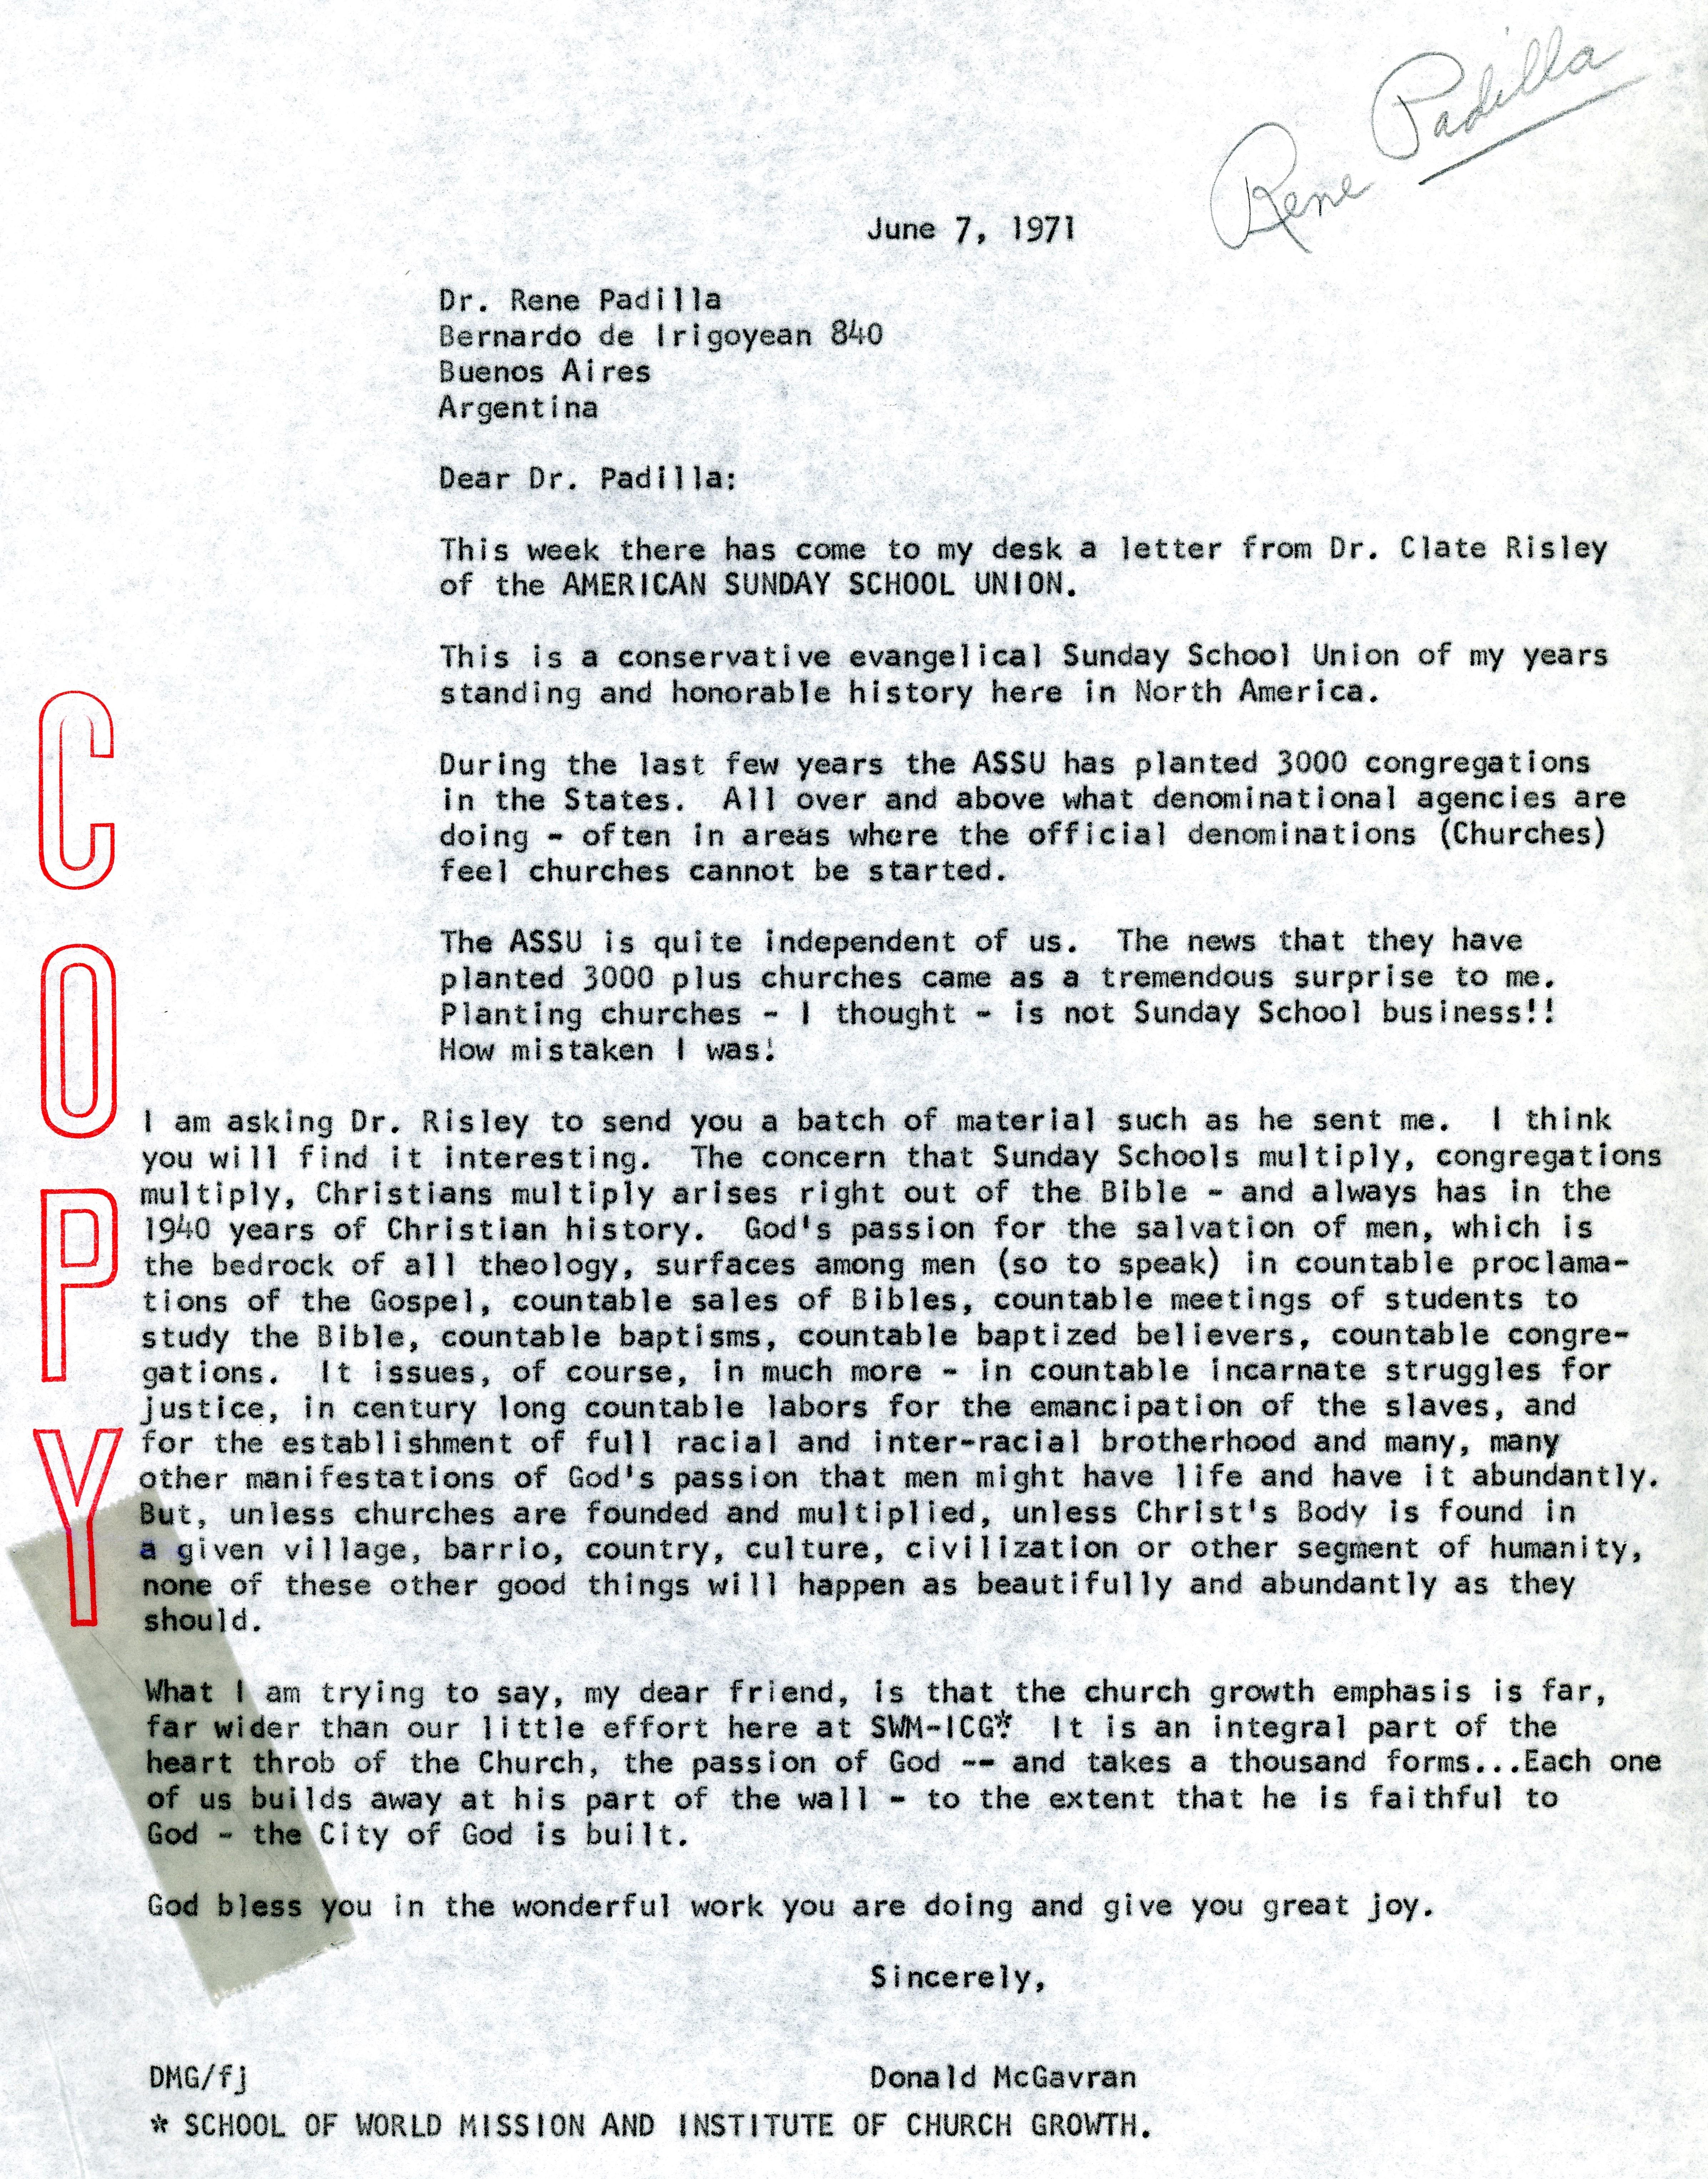 McG to Rene Padilla Letter 6 7 1971